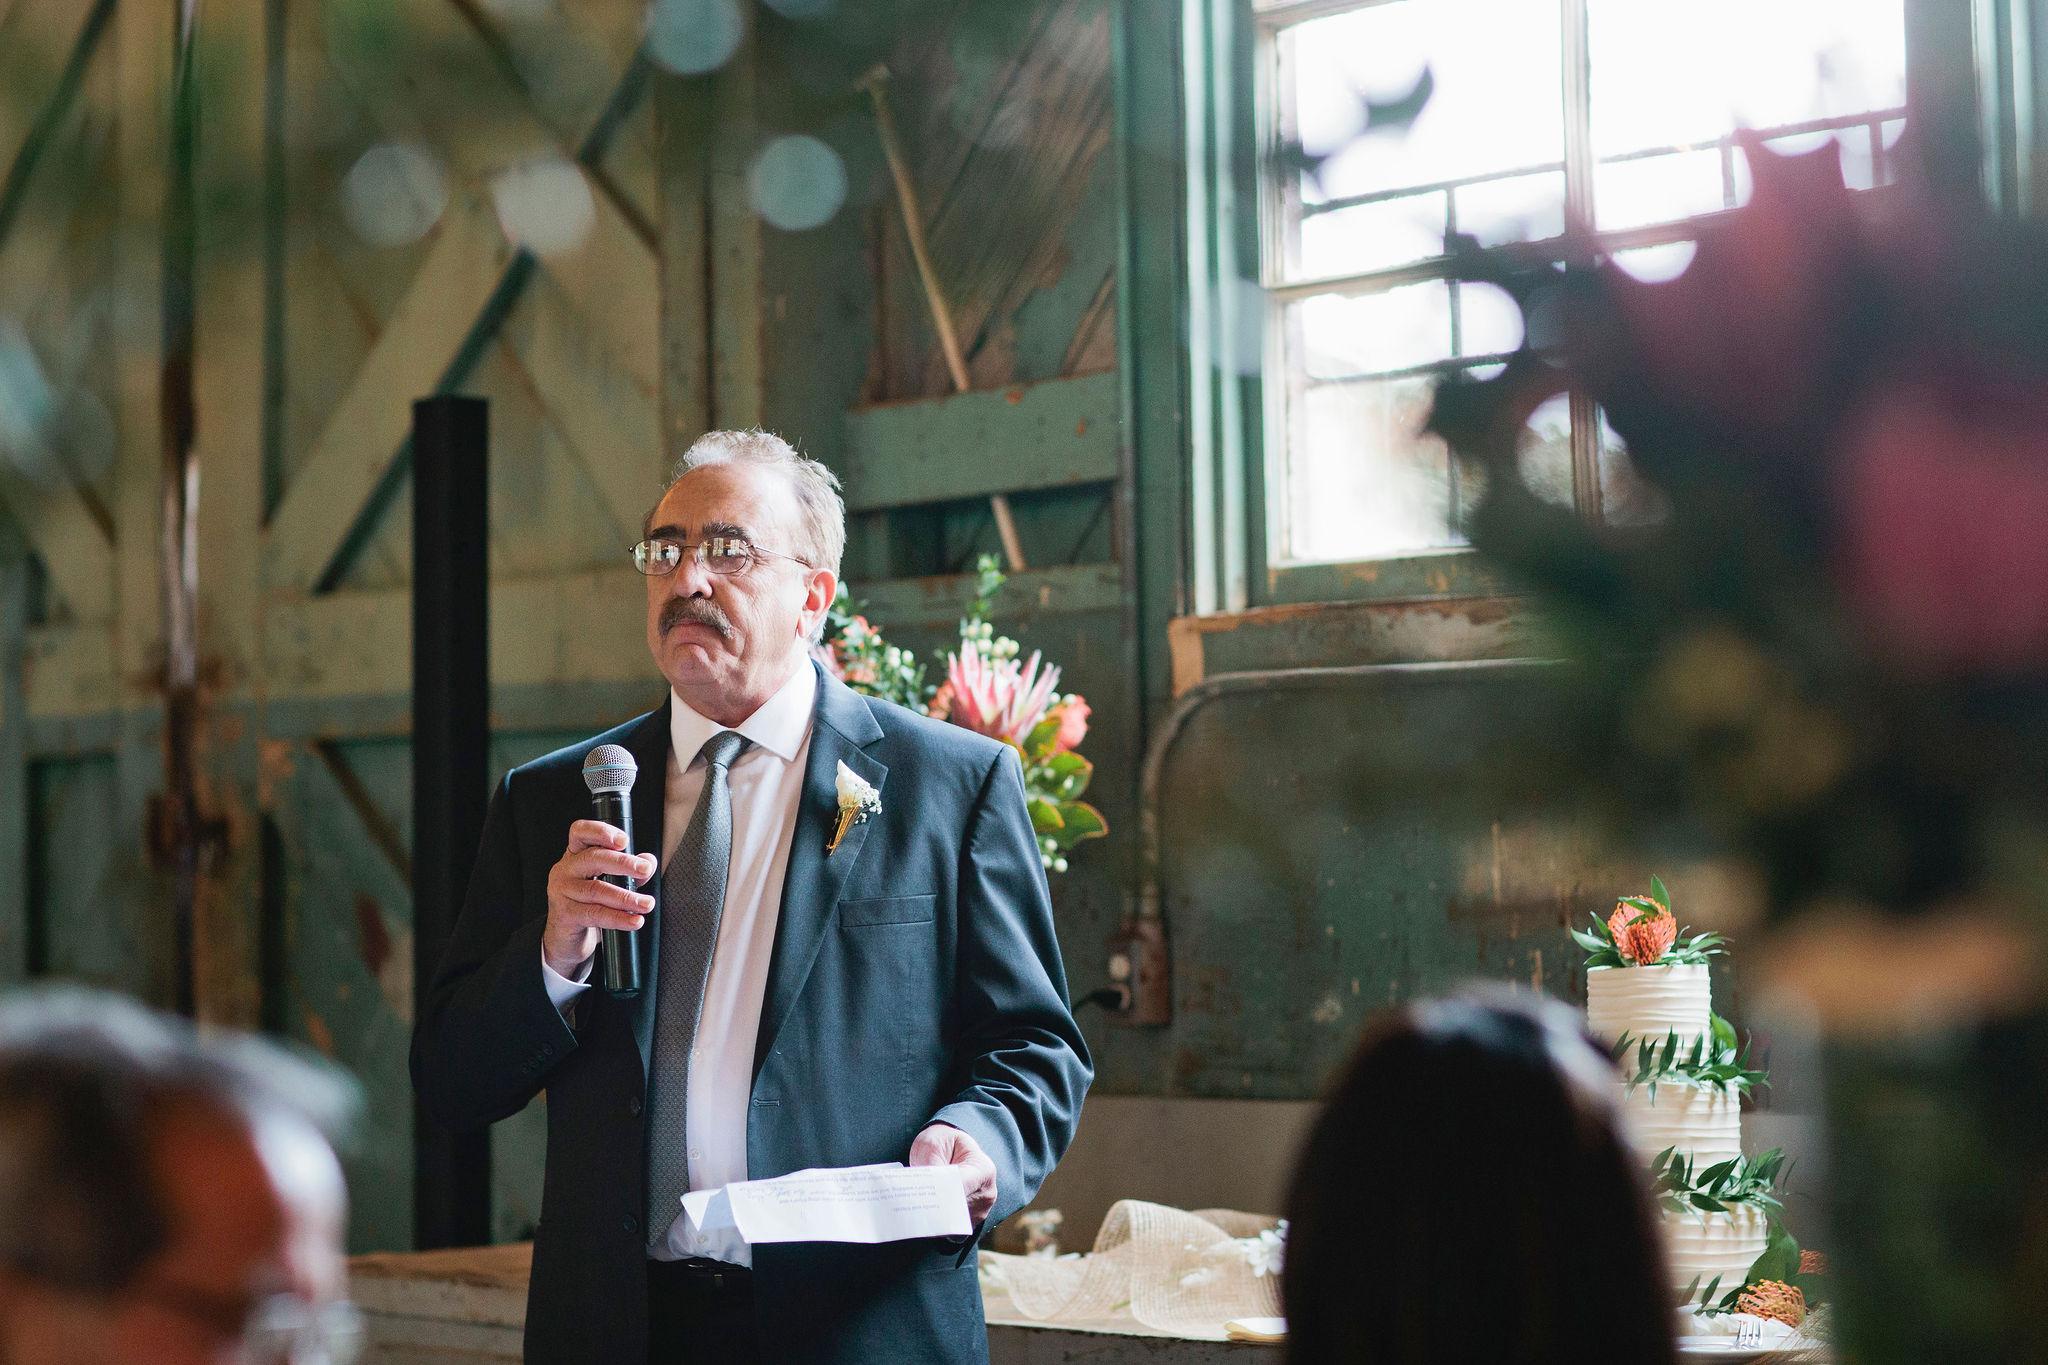 Presidio-Yacht-Club-Wedding-086.JPG